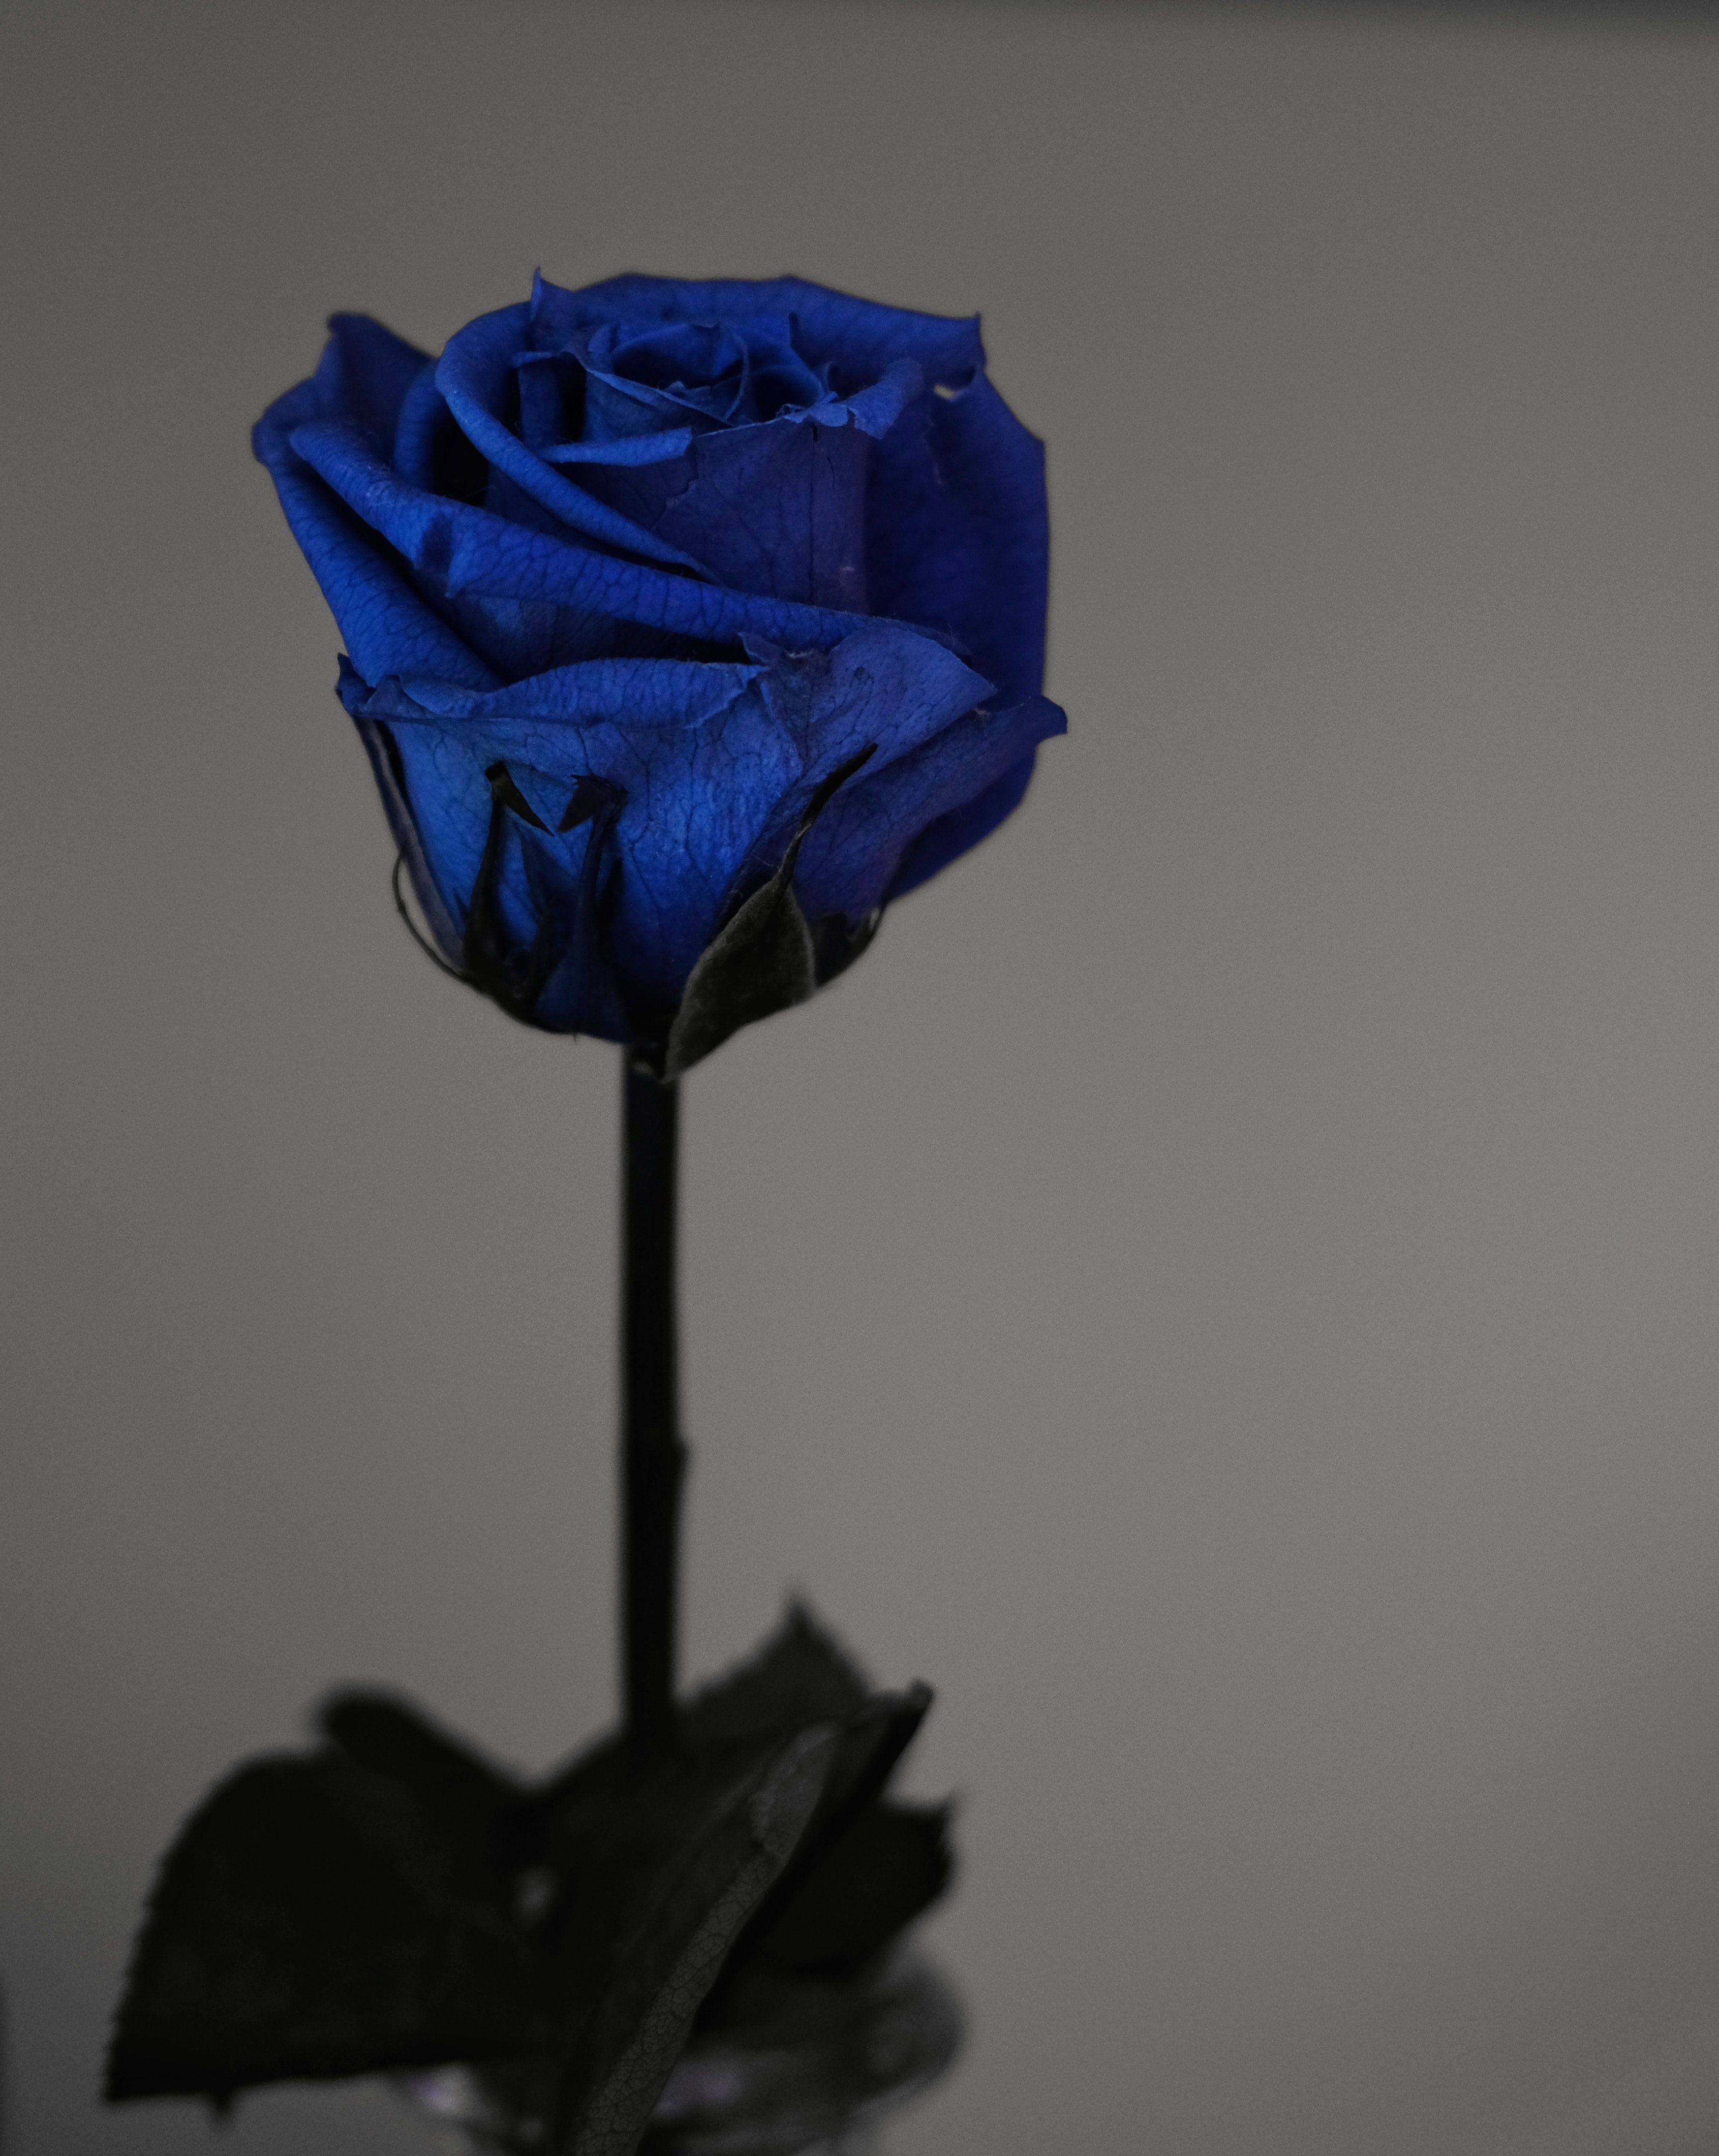 Image Result For Blue Rose Blue Roses Blue Rose Rare Roses